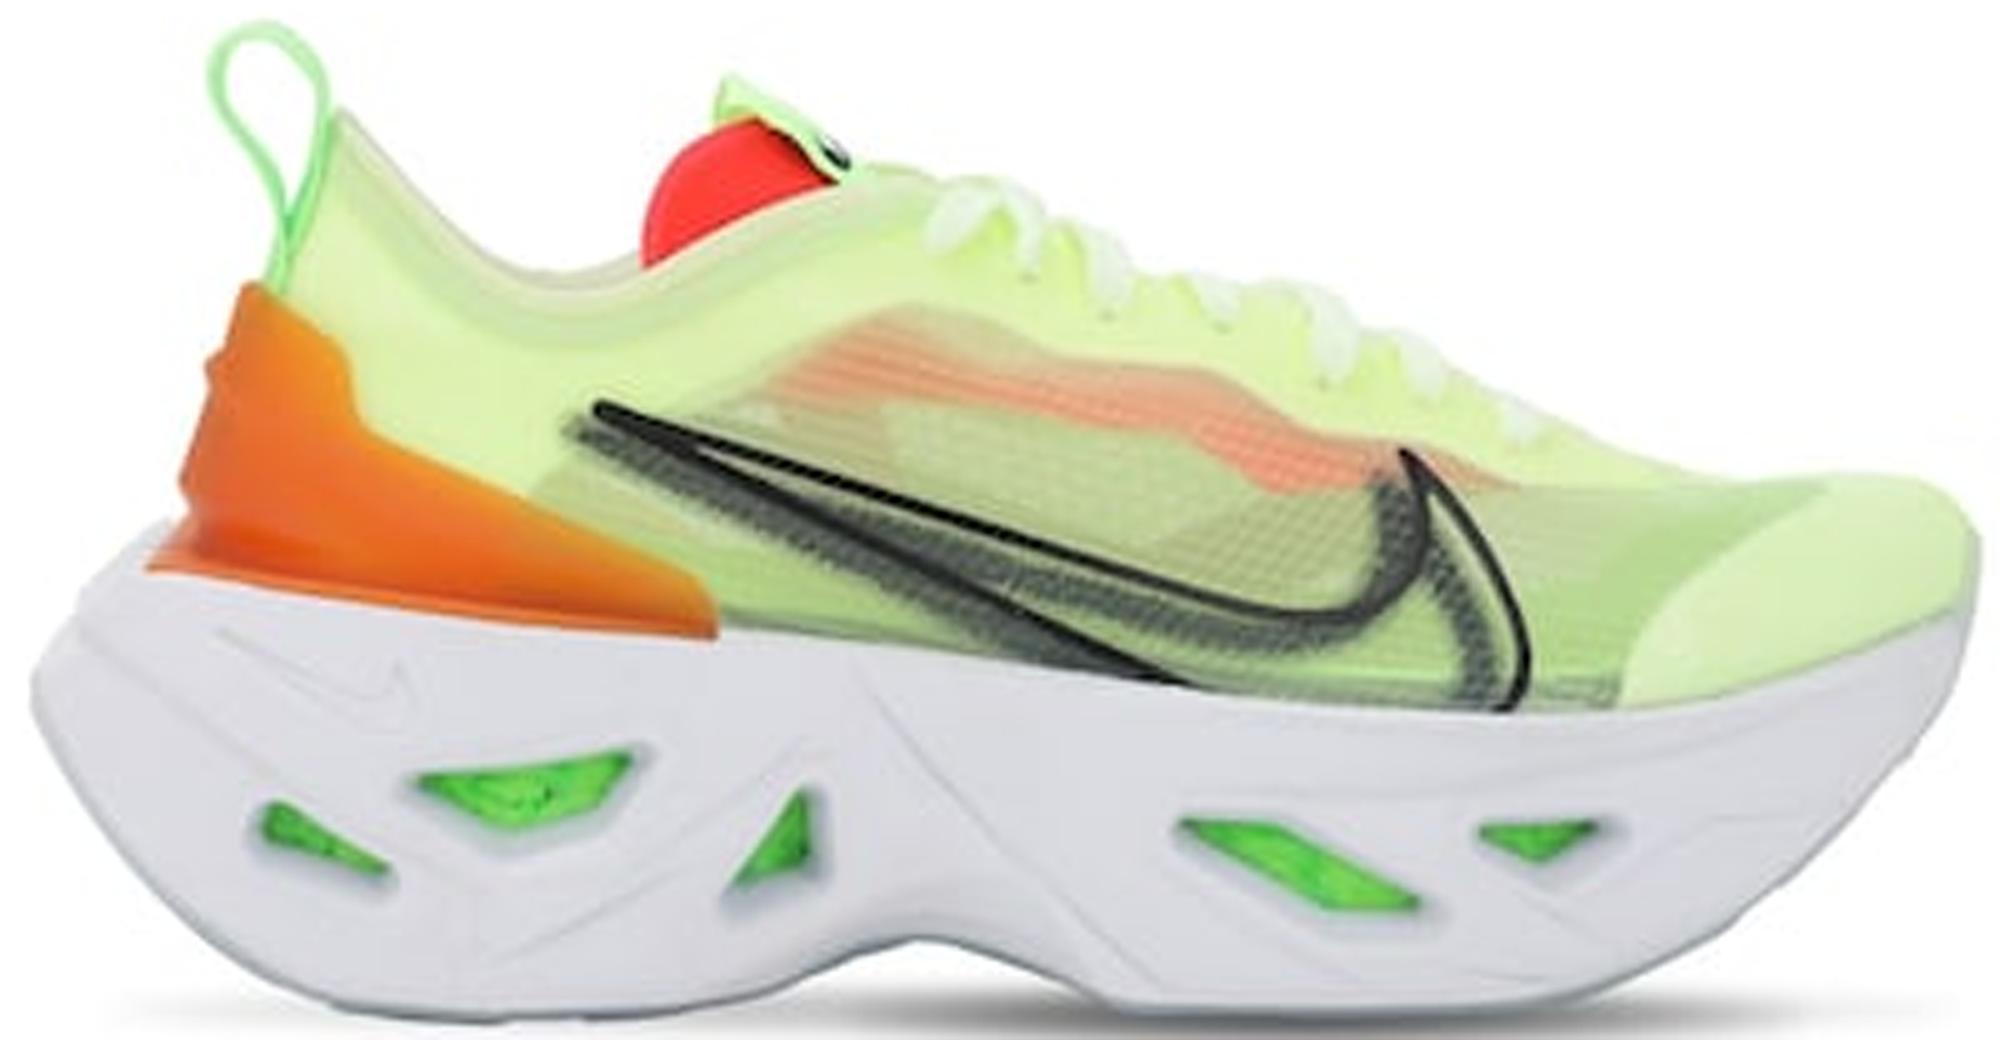 Nike ZoomX Vista Grind Volt (W) • Buy